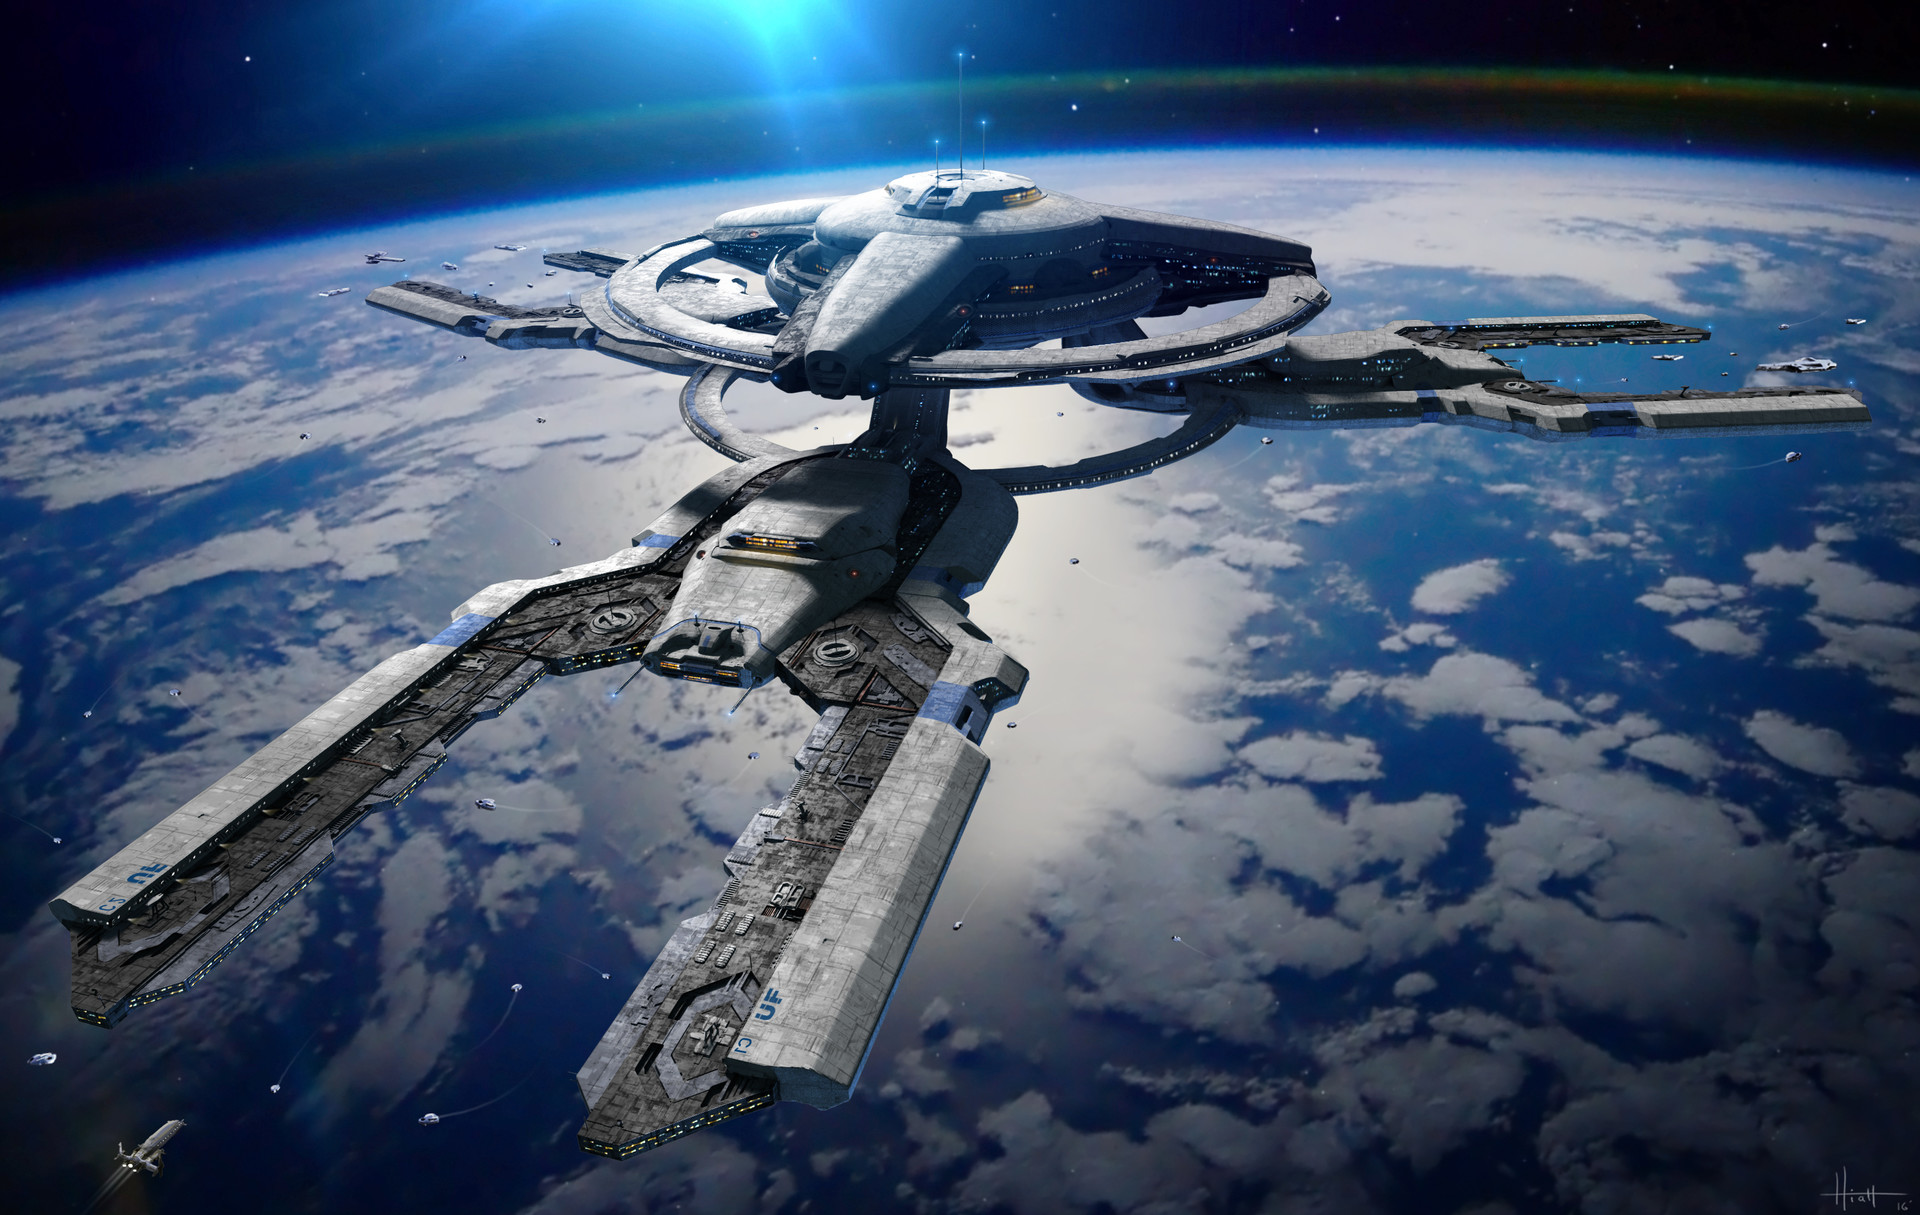 The Cinematic Sci-Fi Art of Nick Hiatt